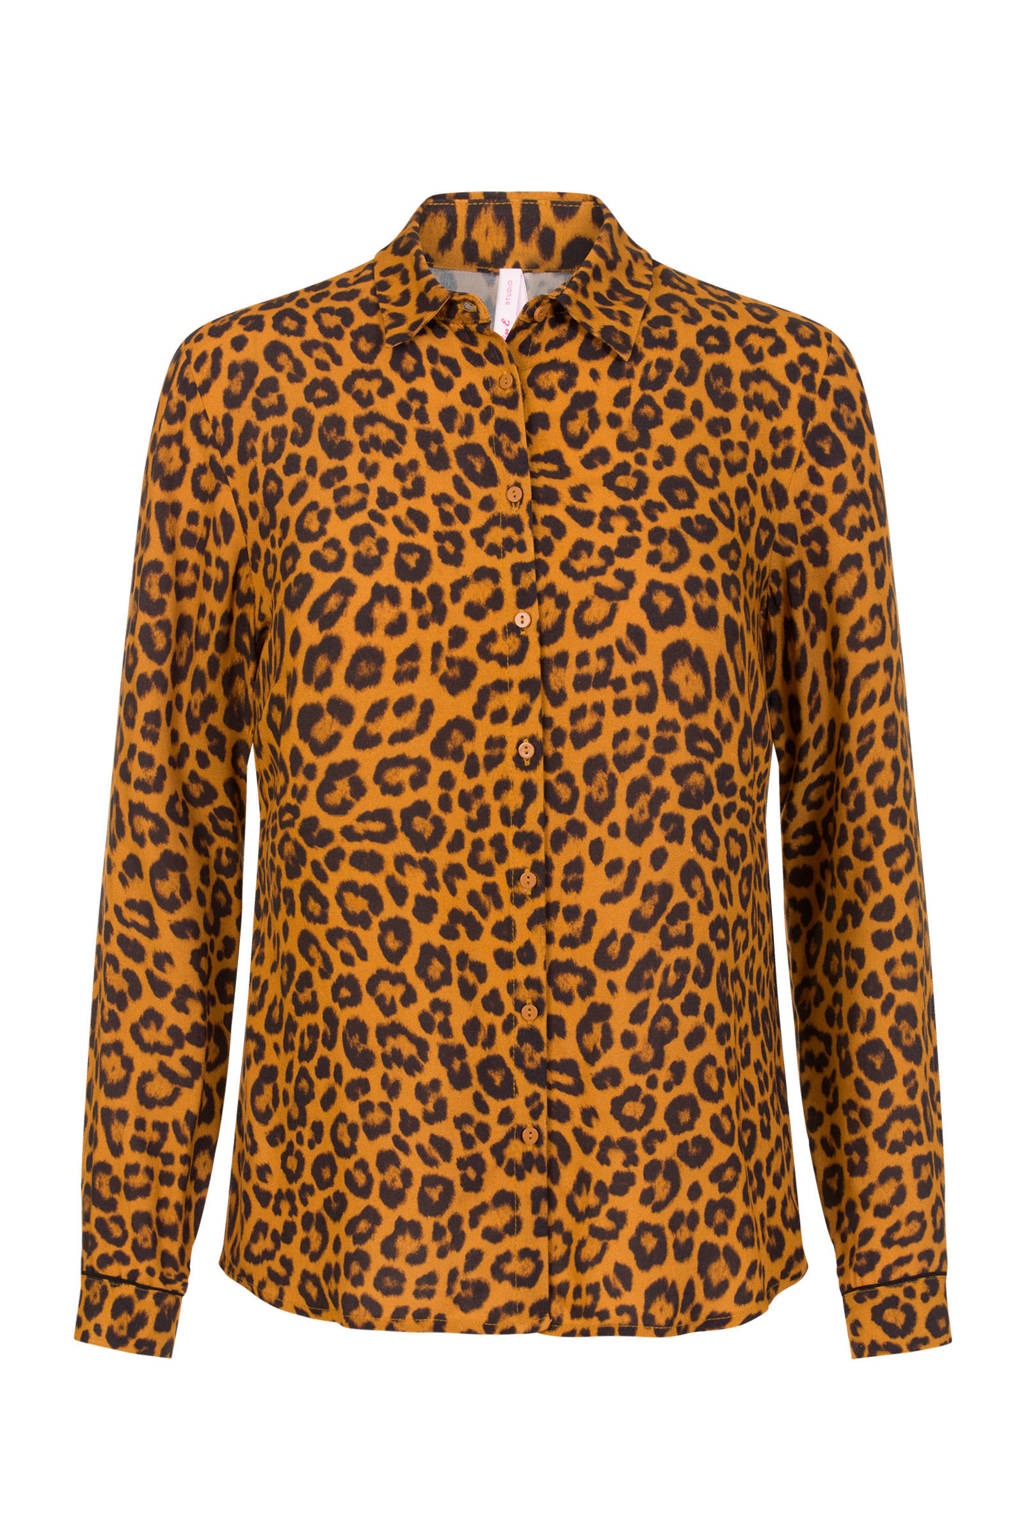 Miss Etam Regulier blouse met panterprint en contrastbies bruin, Geel/zwart